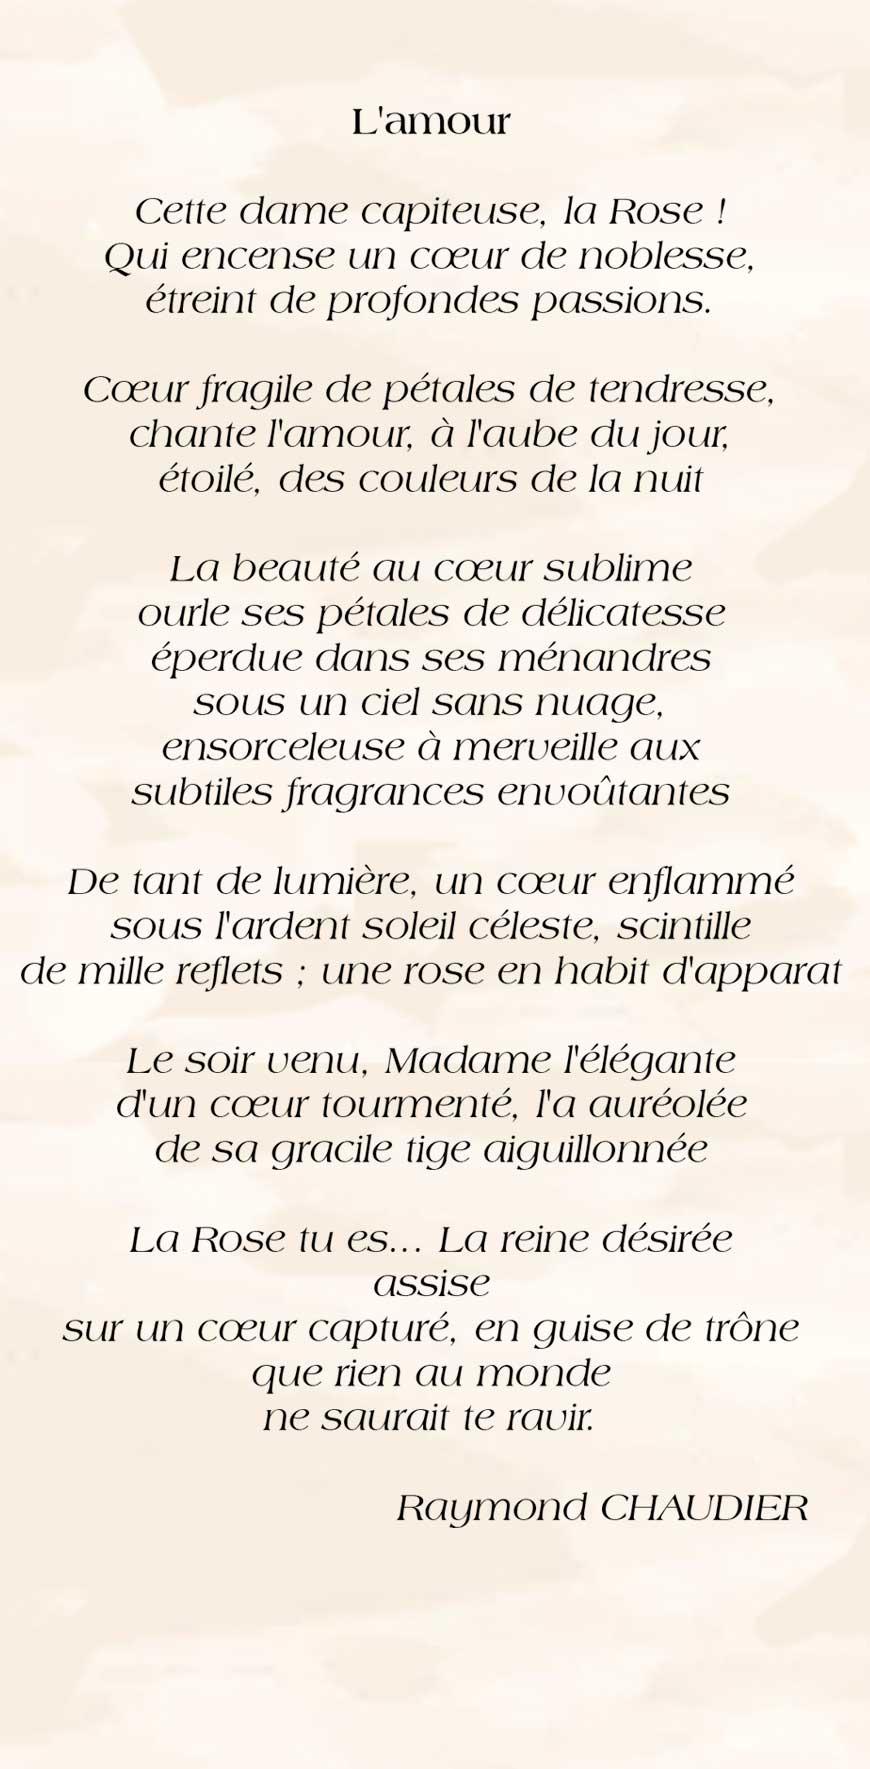 L'amour - Raymond Chaudier